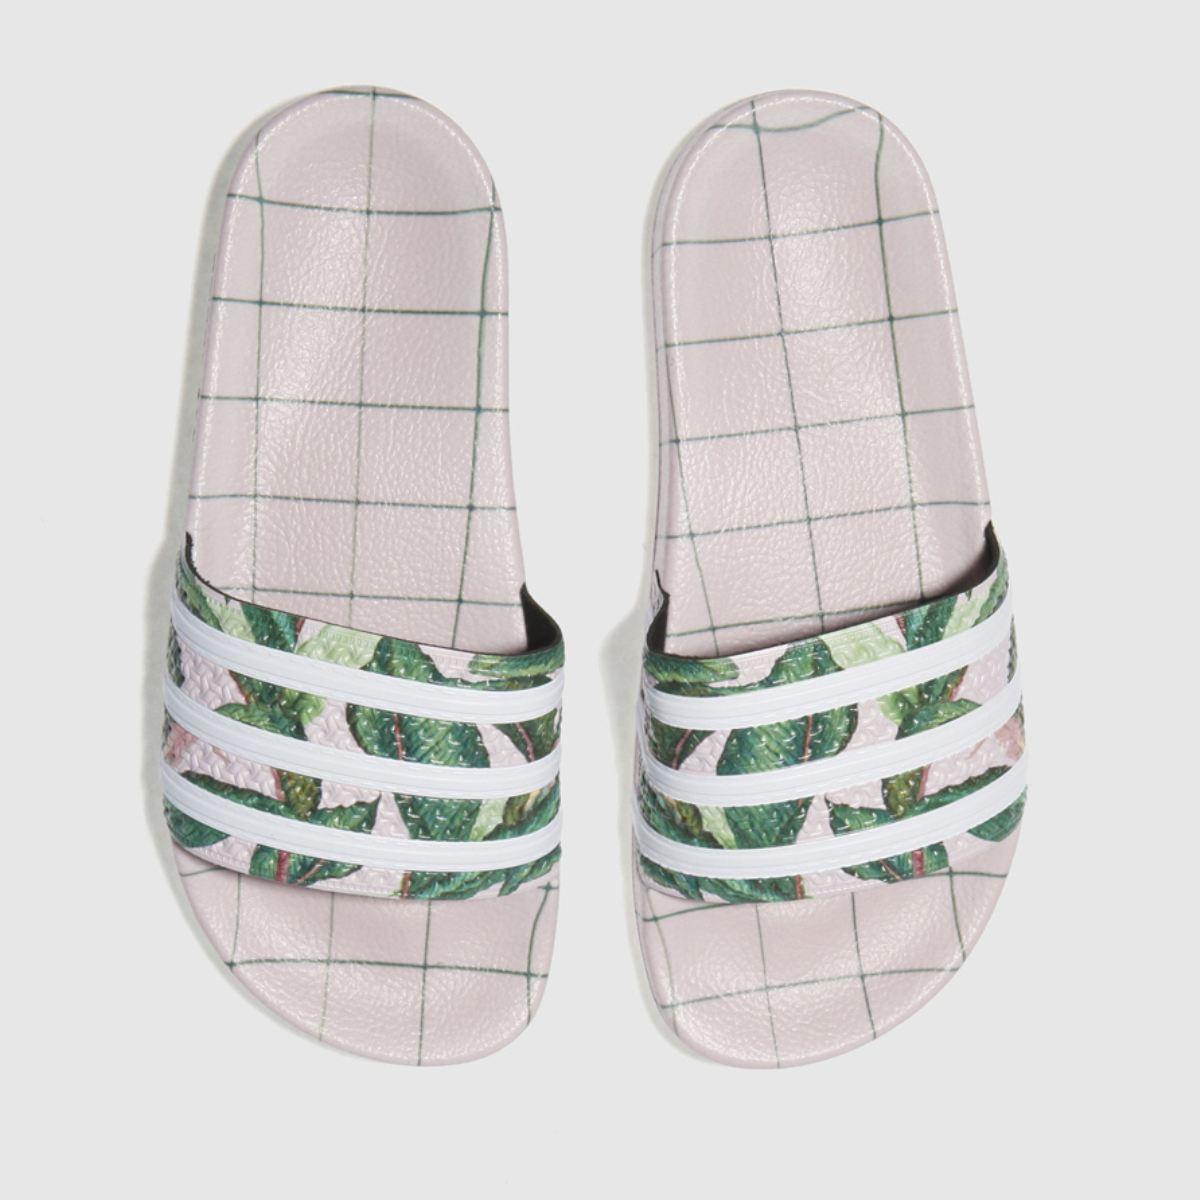 Adidas Pale Pink Adilette Farm Sandals